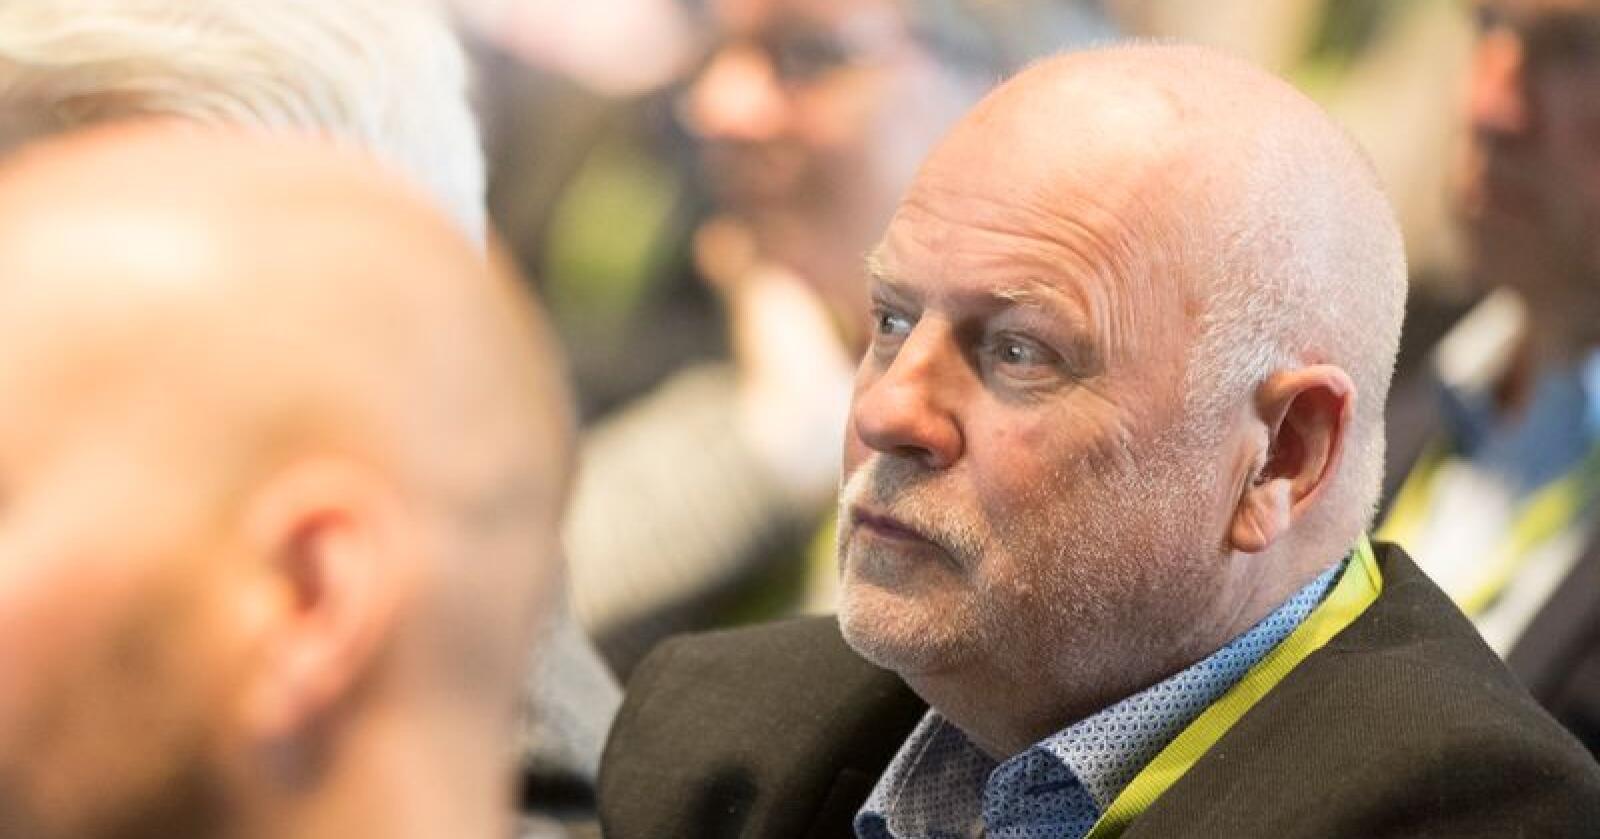 TV-pastor Jan Hanvold går hardt ut mot det han mener er et «klimahysteri» i mediene. Arkivfoto: Håkon Mosvold Larsen / NTB scanpix